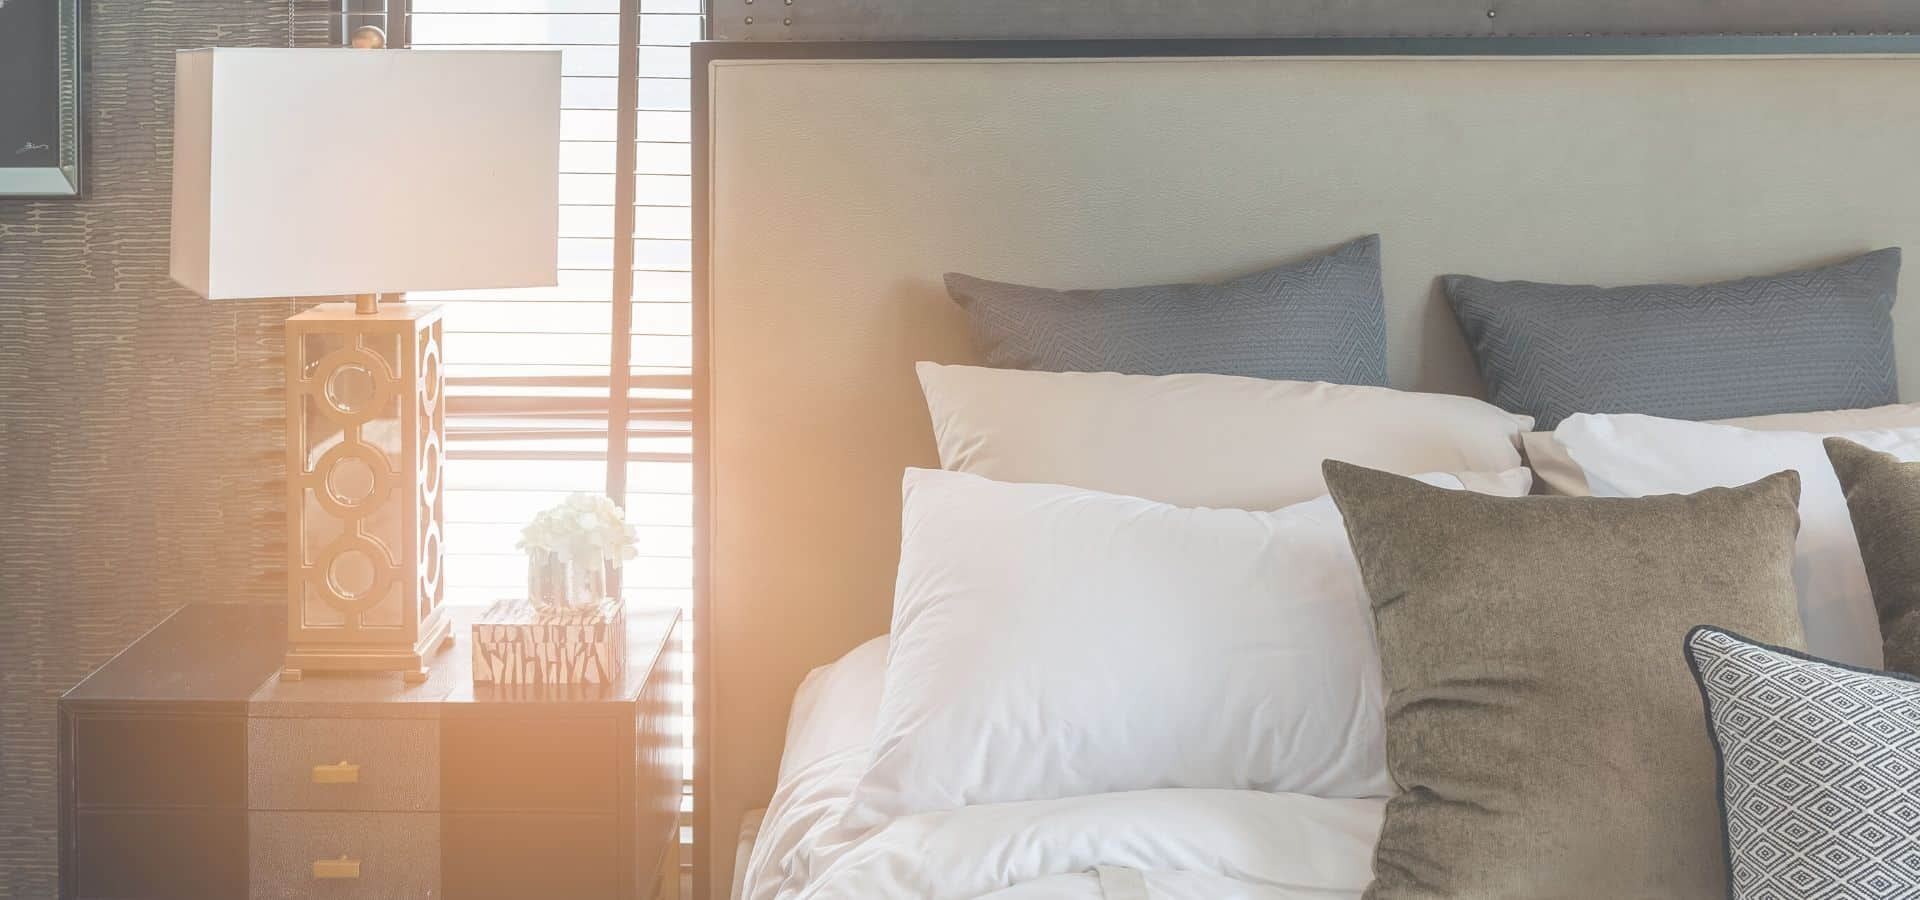 Producent łóżka hotelowe